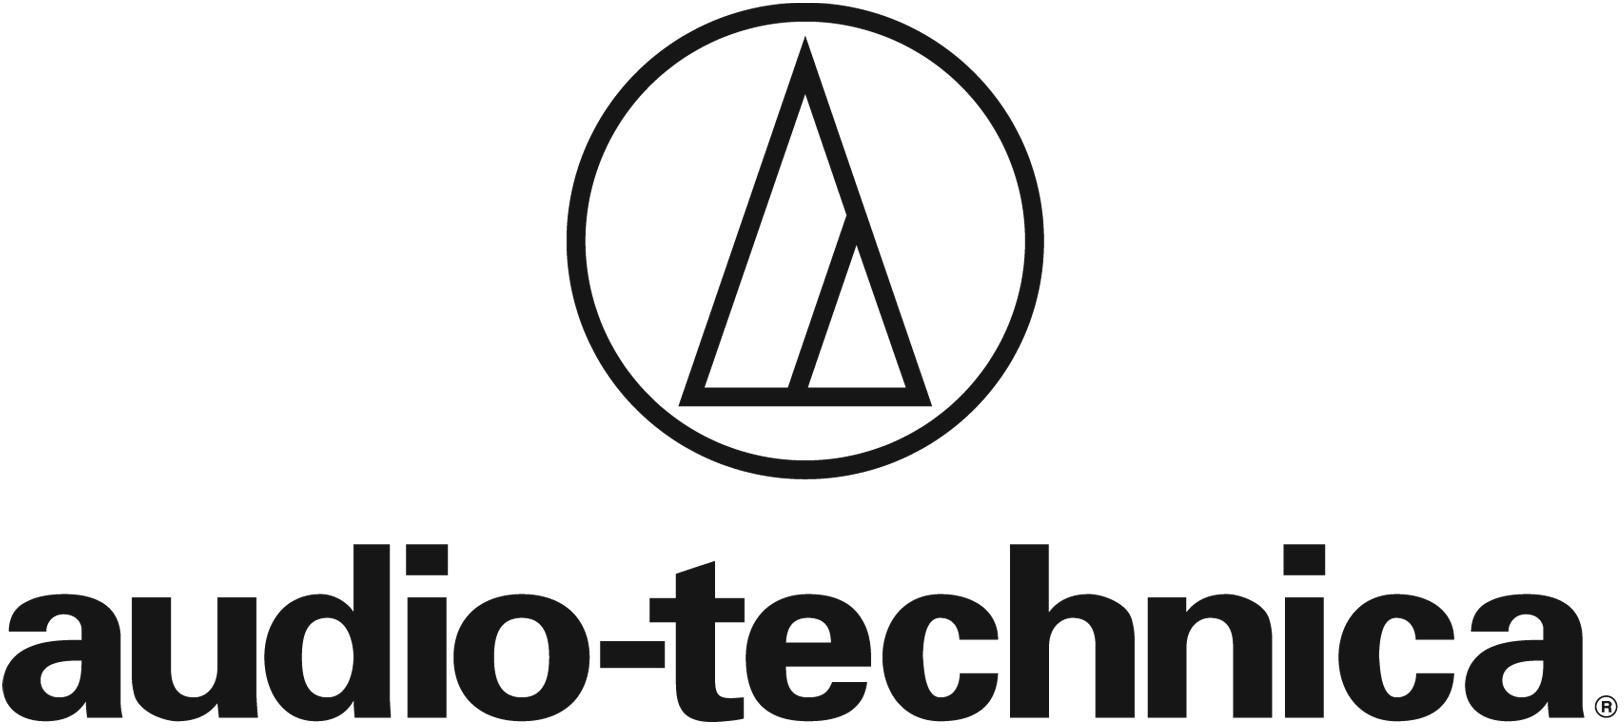 audio-technica-20r.jpg